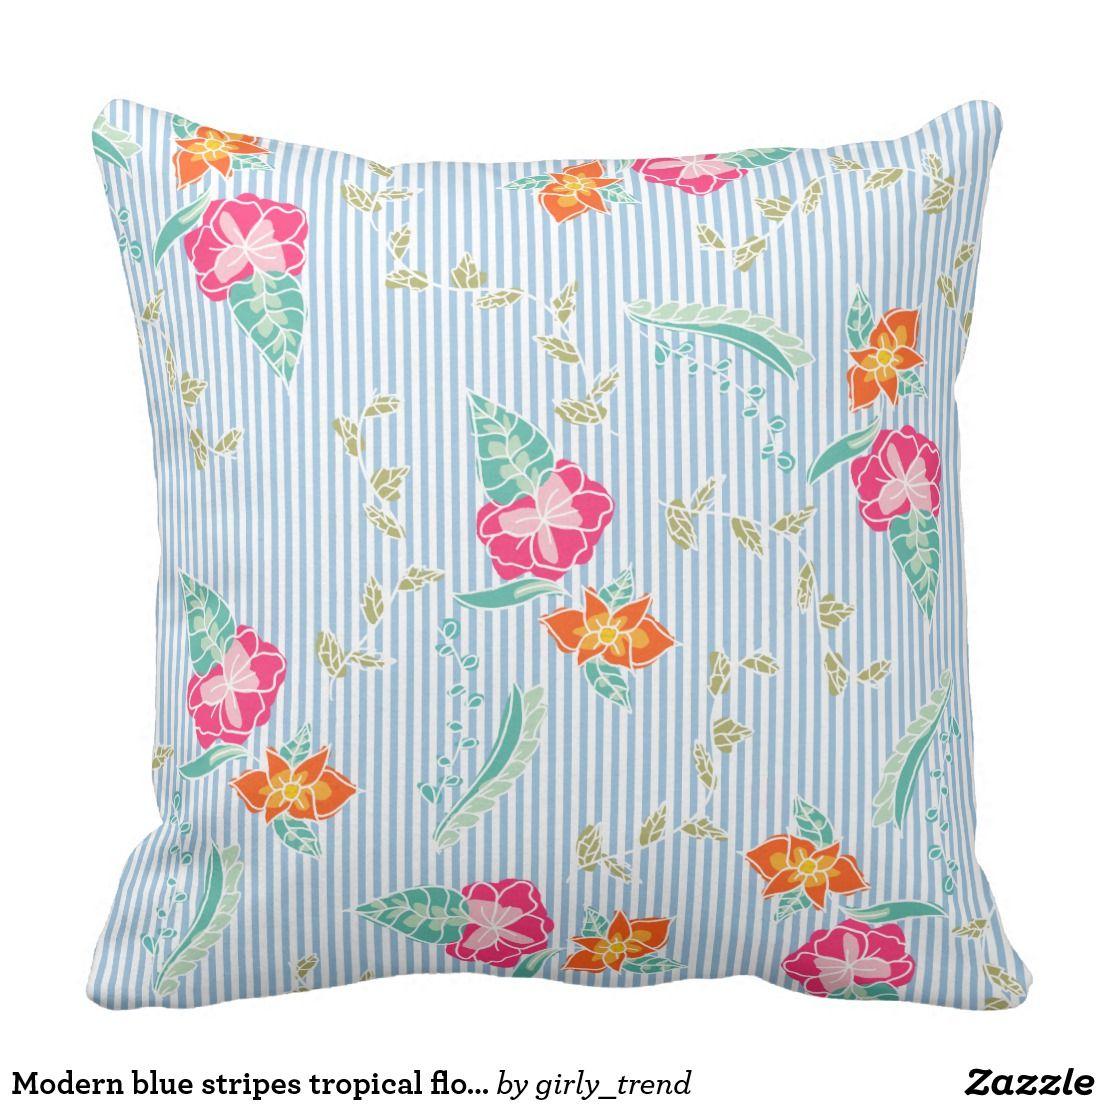 Modern blue stripes tropical floral pattern